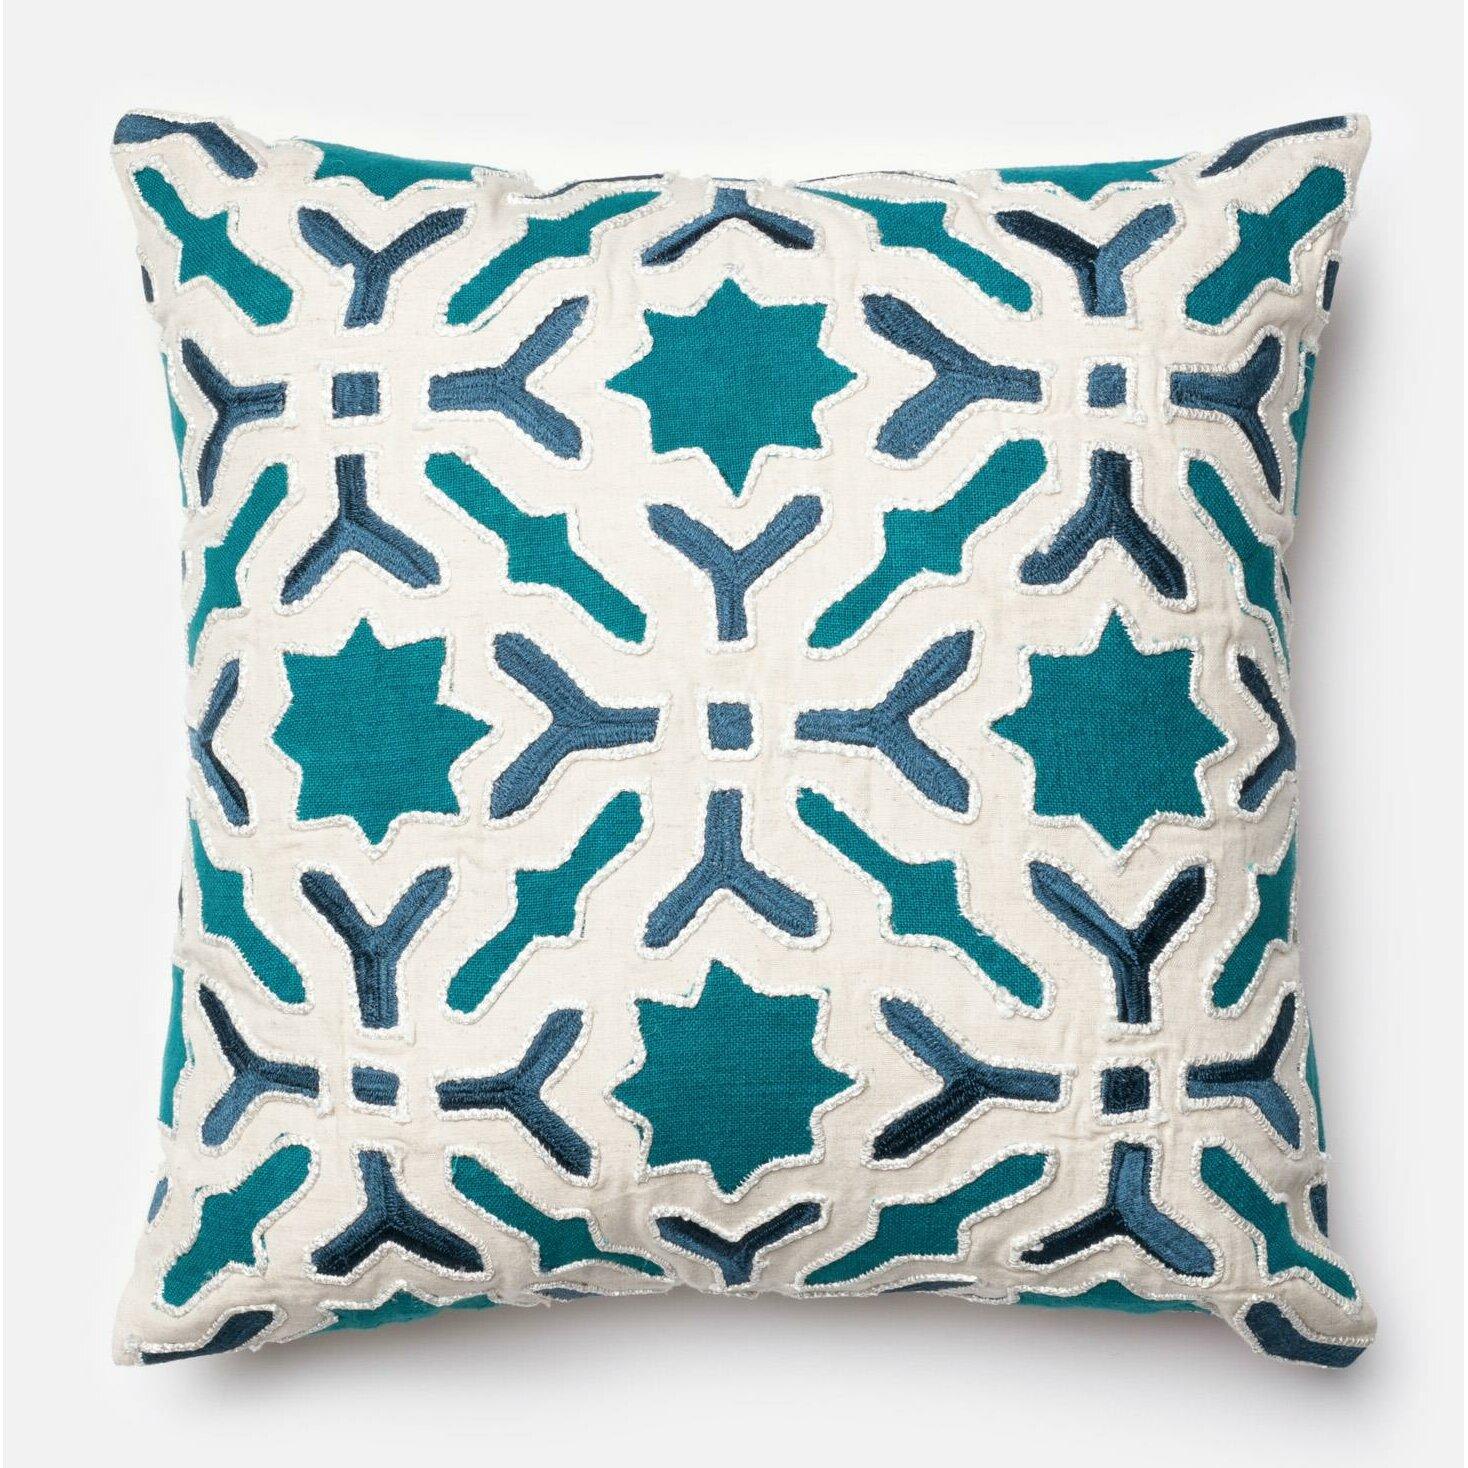 Loloi Rugs 100% Cotton Throw Pillow Wayfair